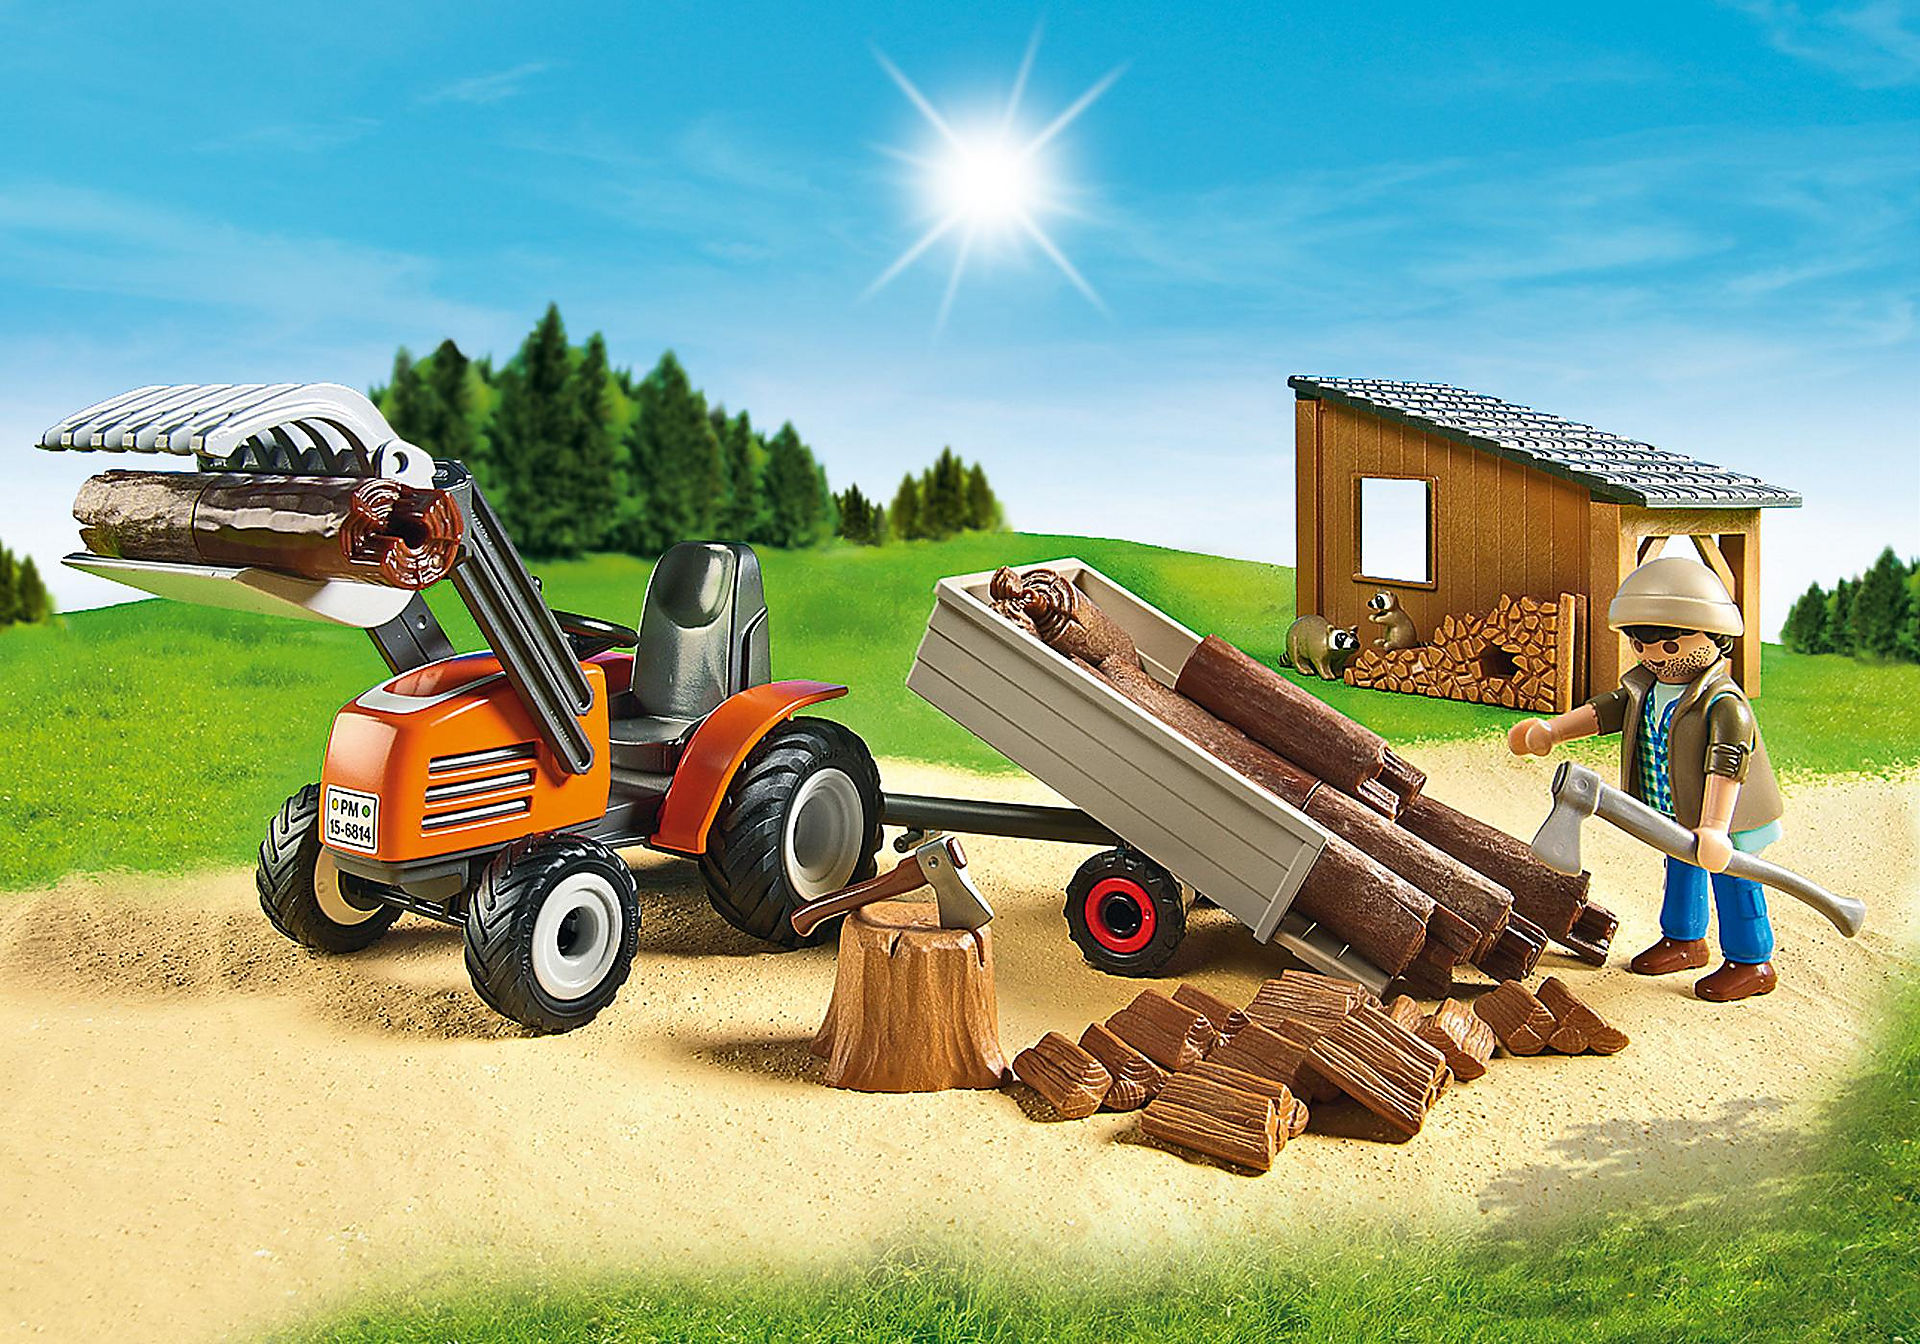 6814 Holzfäller mit Traktor zoom image5